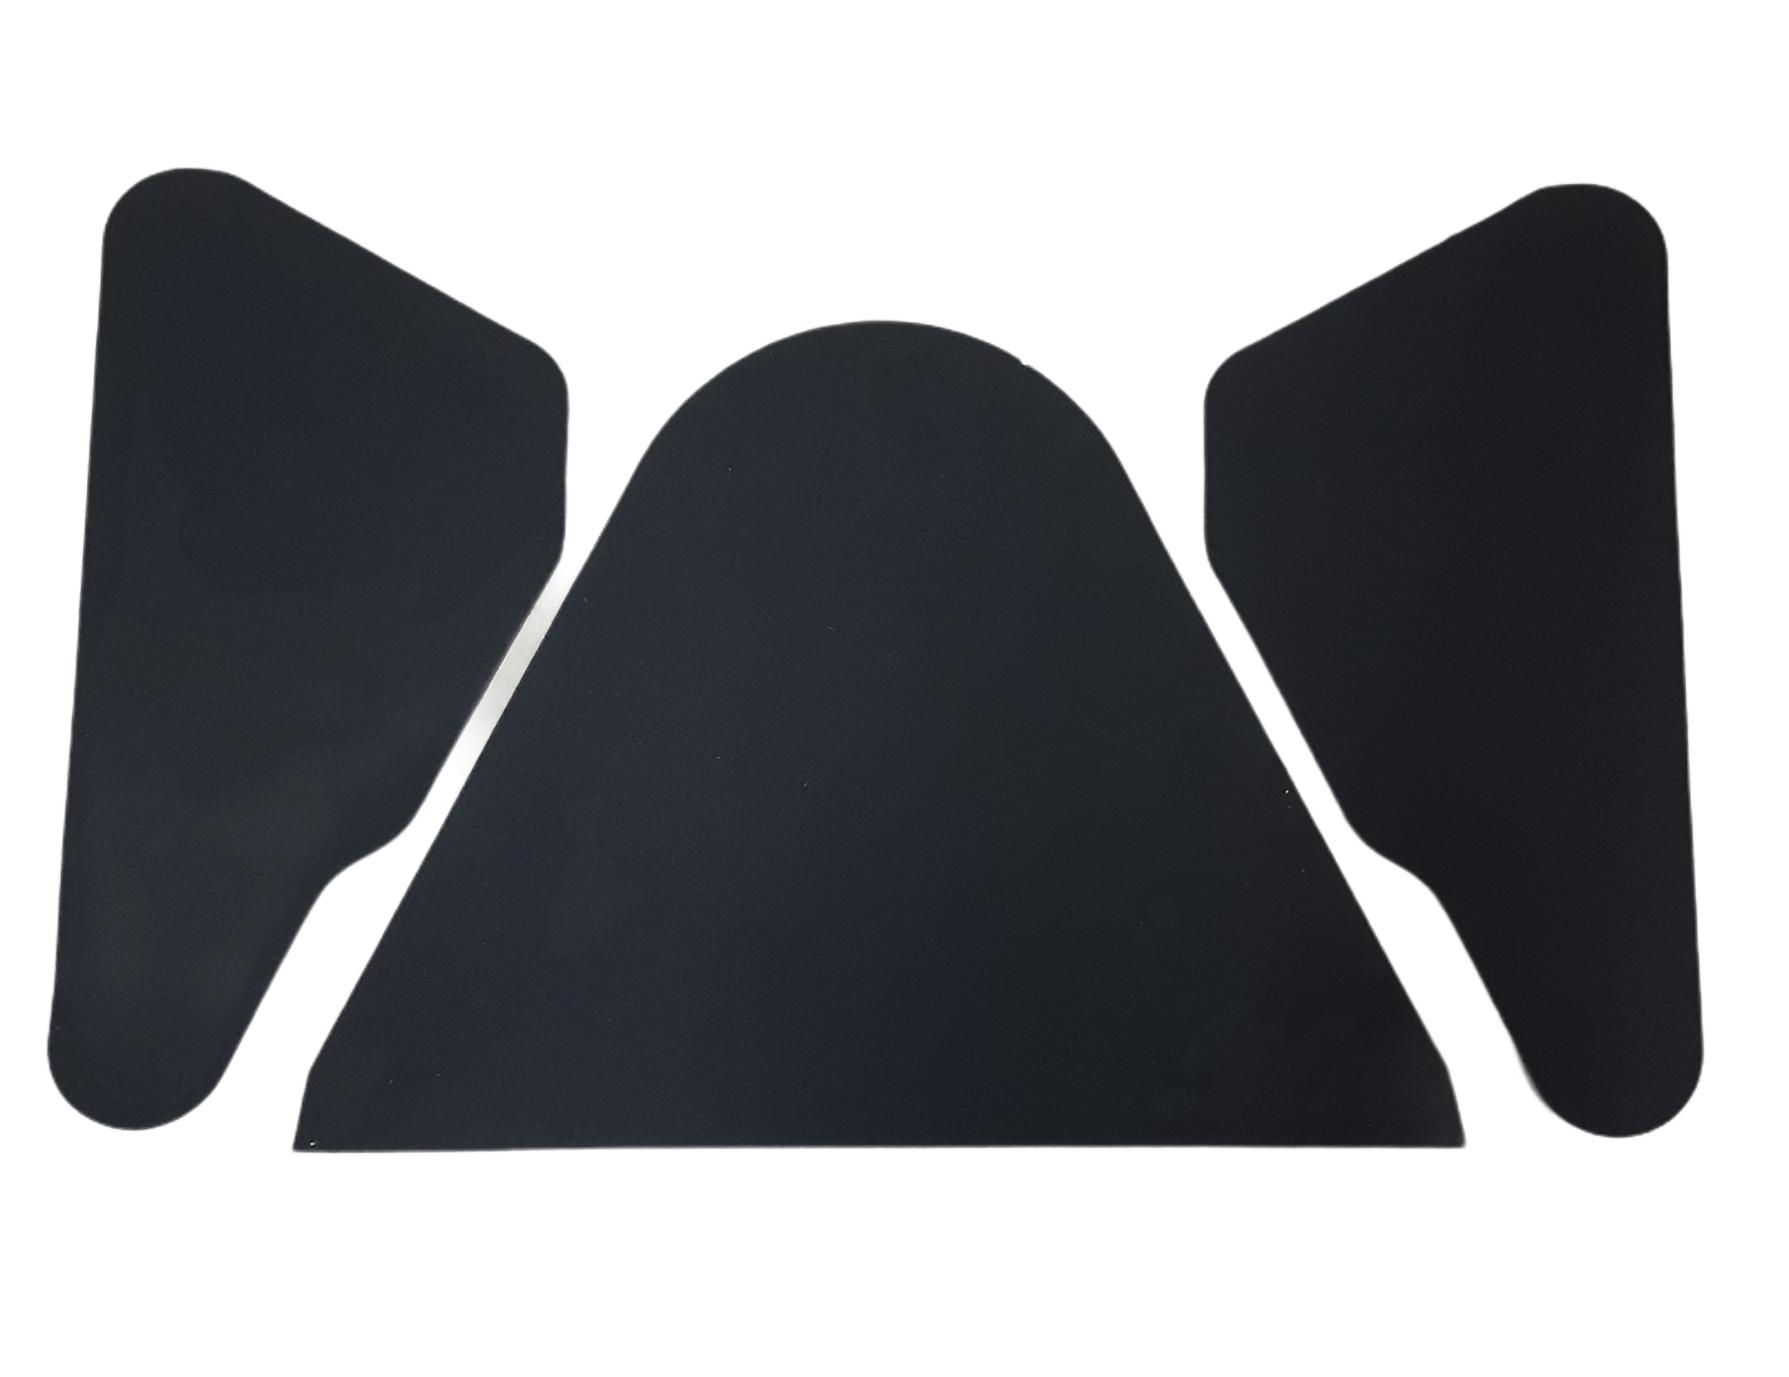 2 CV Dämmung Heckklappe, 3 teilig, in 2,5 mm schwarzem Nadelvlies selbstklebend